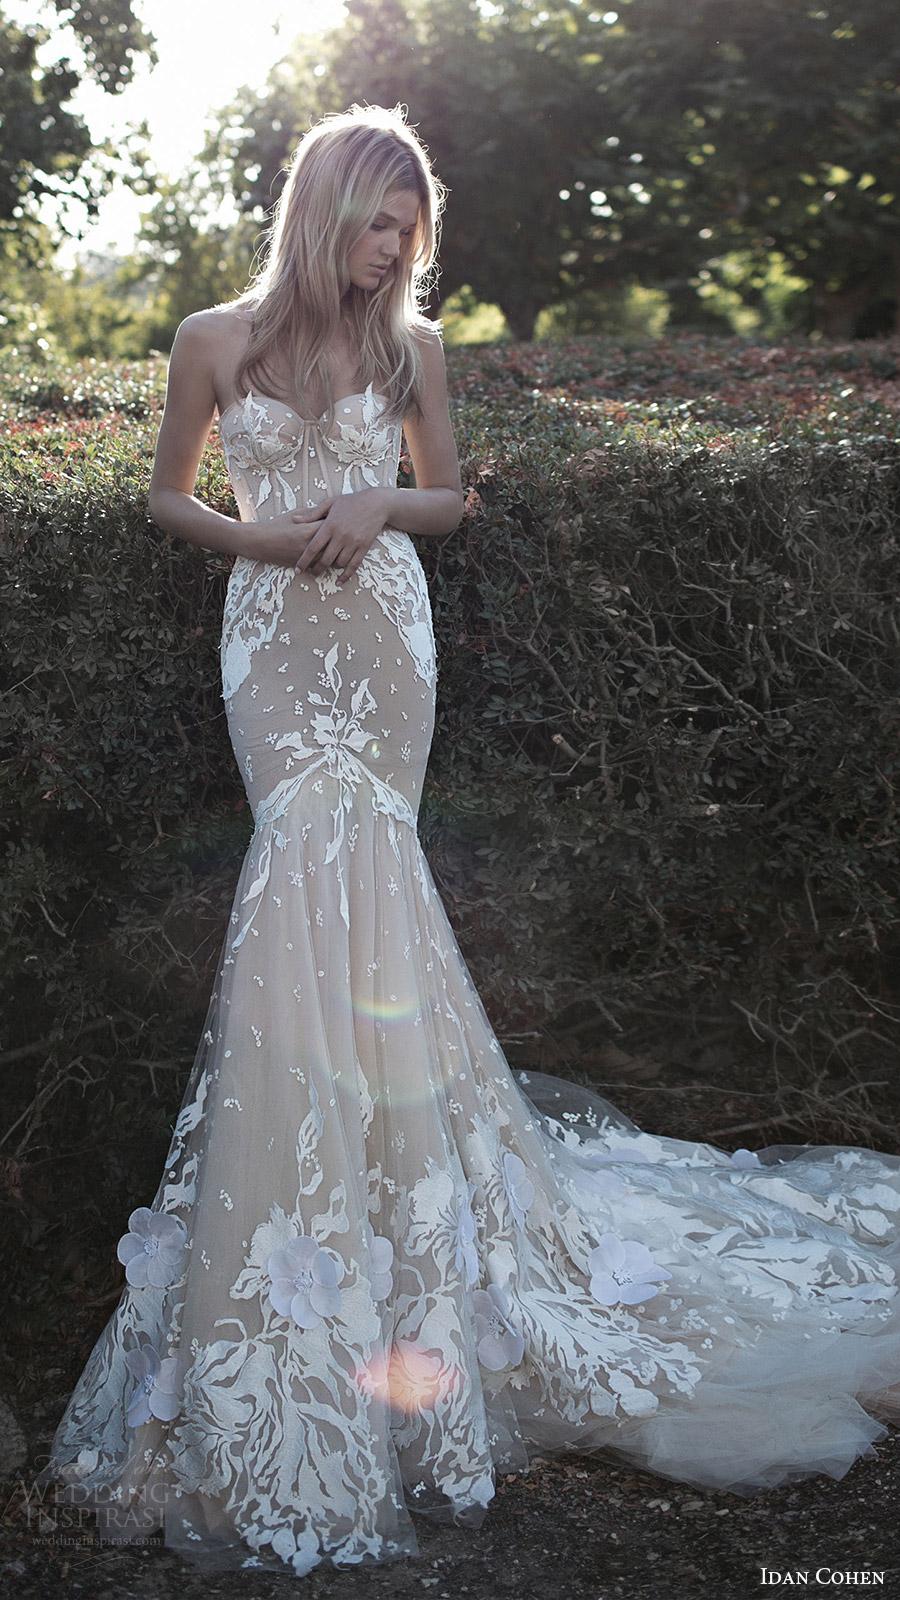 vestido de novia de la sirena del amor mv Idan Cohen de novia sin tirantes de 2017 (Emily Mercedes) mv